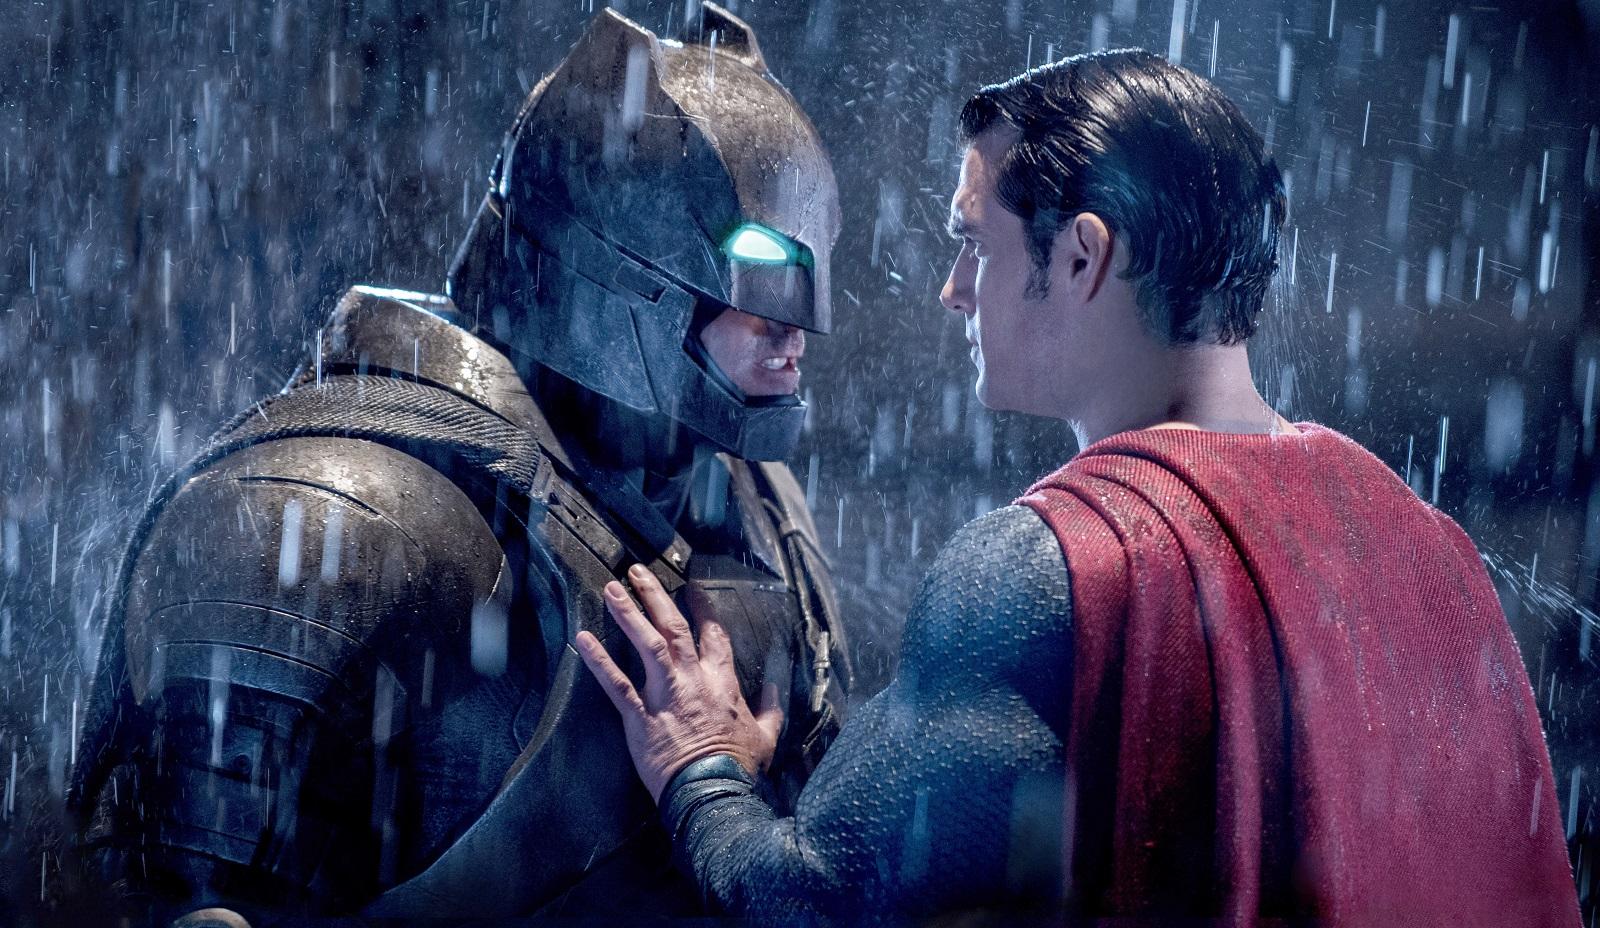 Ben Affleck as Batman and Henry Cavill as Superman in 'Batman v Superman: Dawn of Justice.' (Clay Enos, Warner Bros. Pictures)